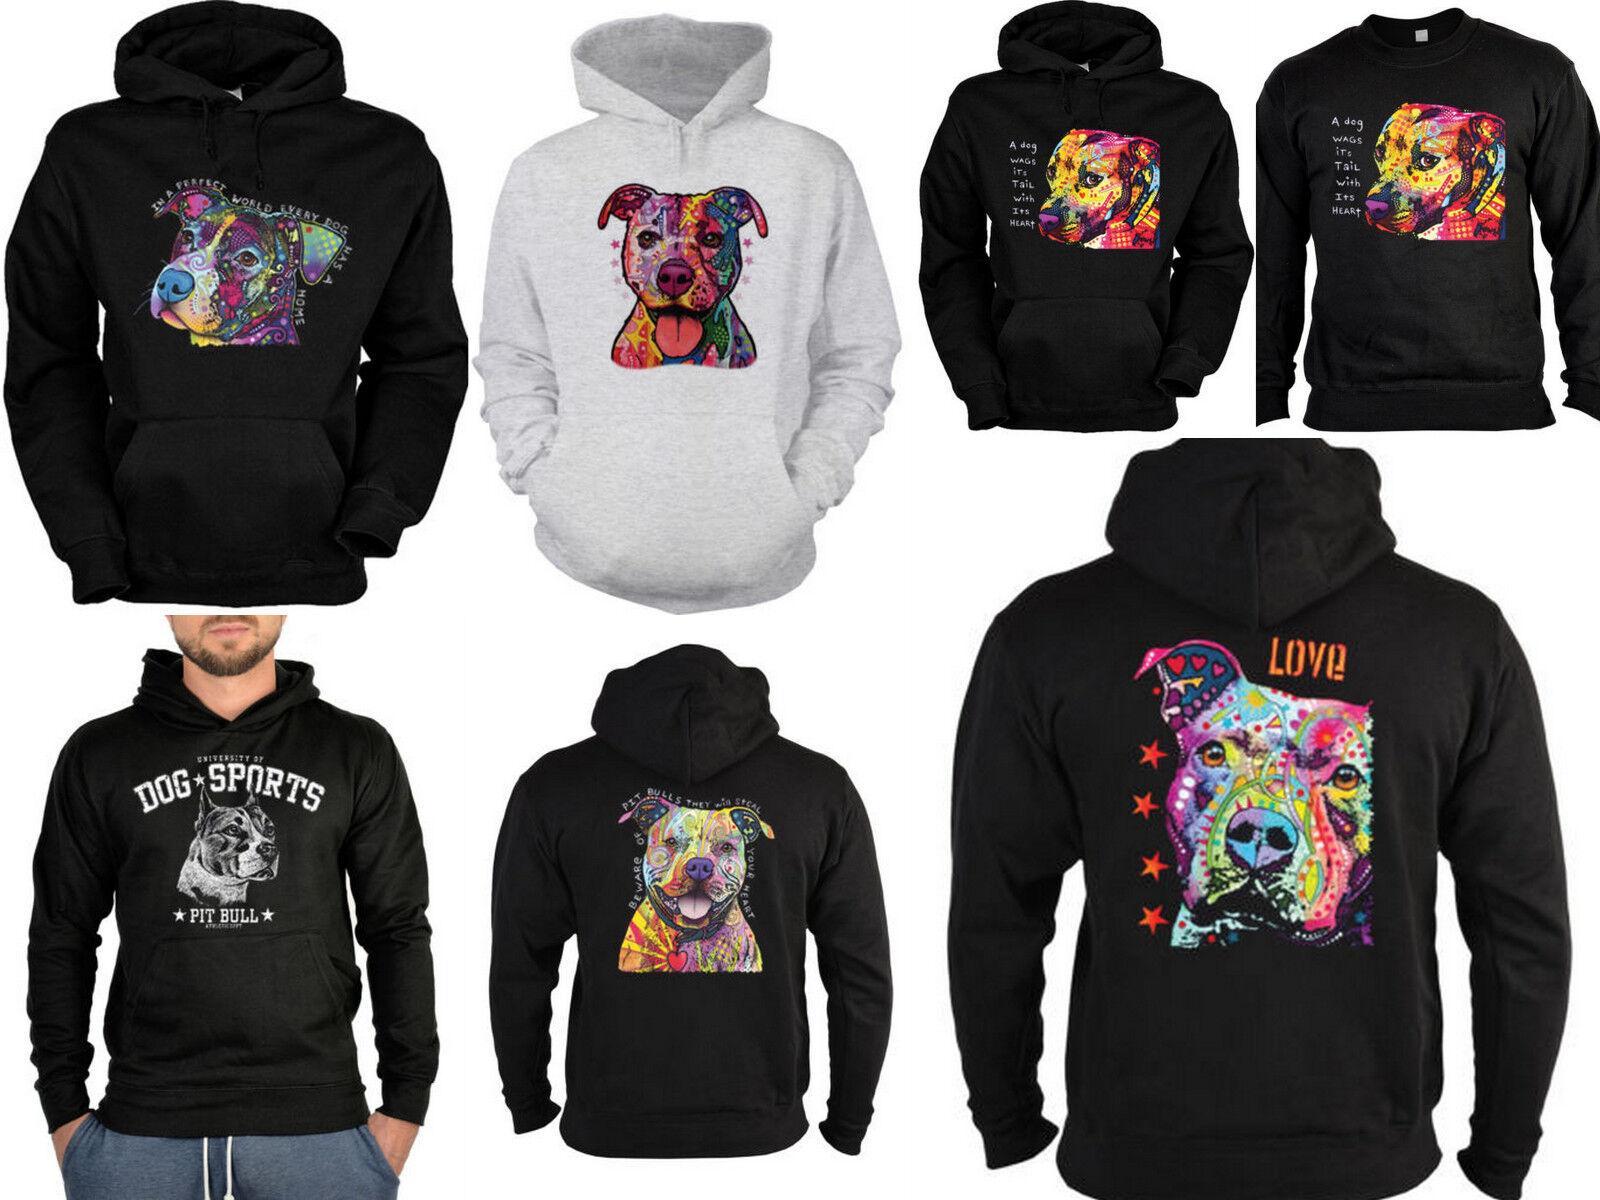 Pitbull Sweater - Kapuzensweater - Zip Hoodie Hunderassen Hunde Motiv Pit Bull